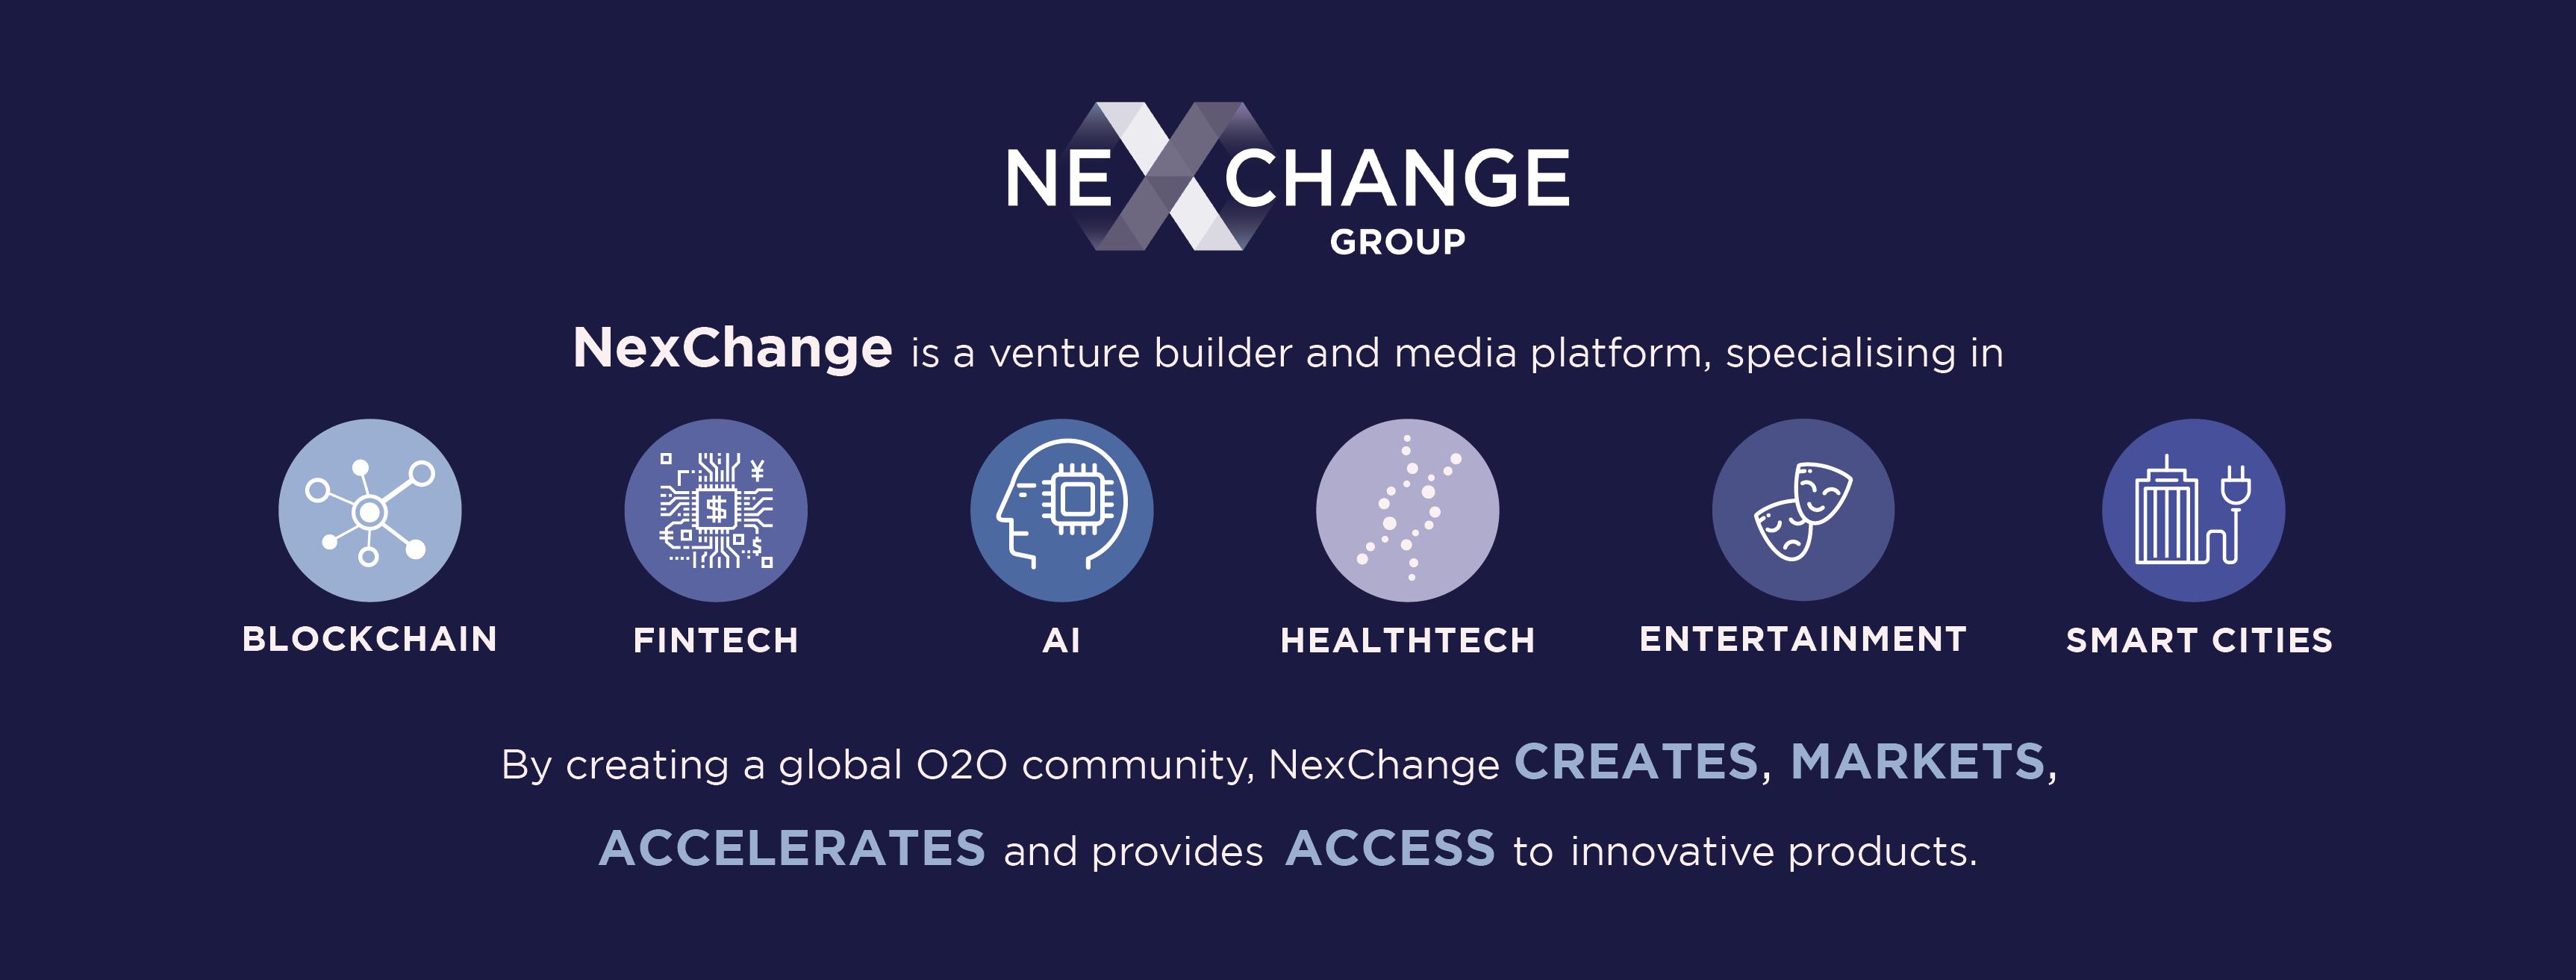 NexChange Group